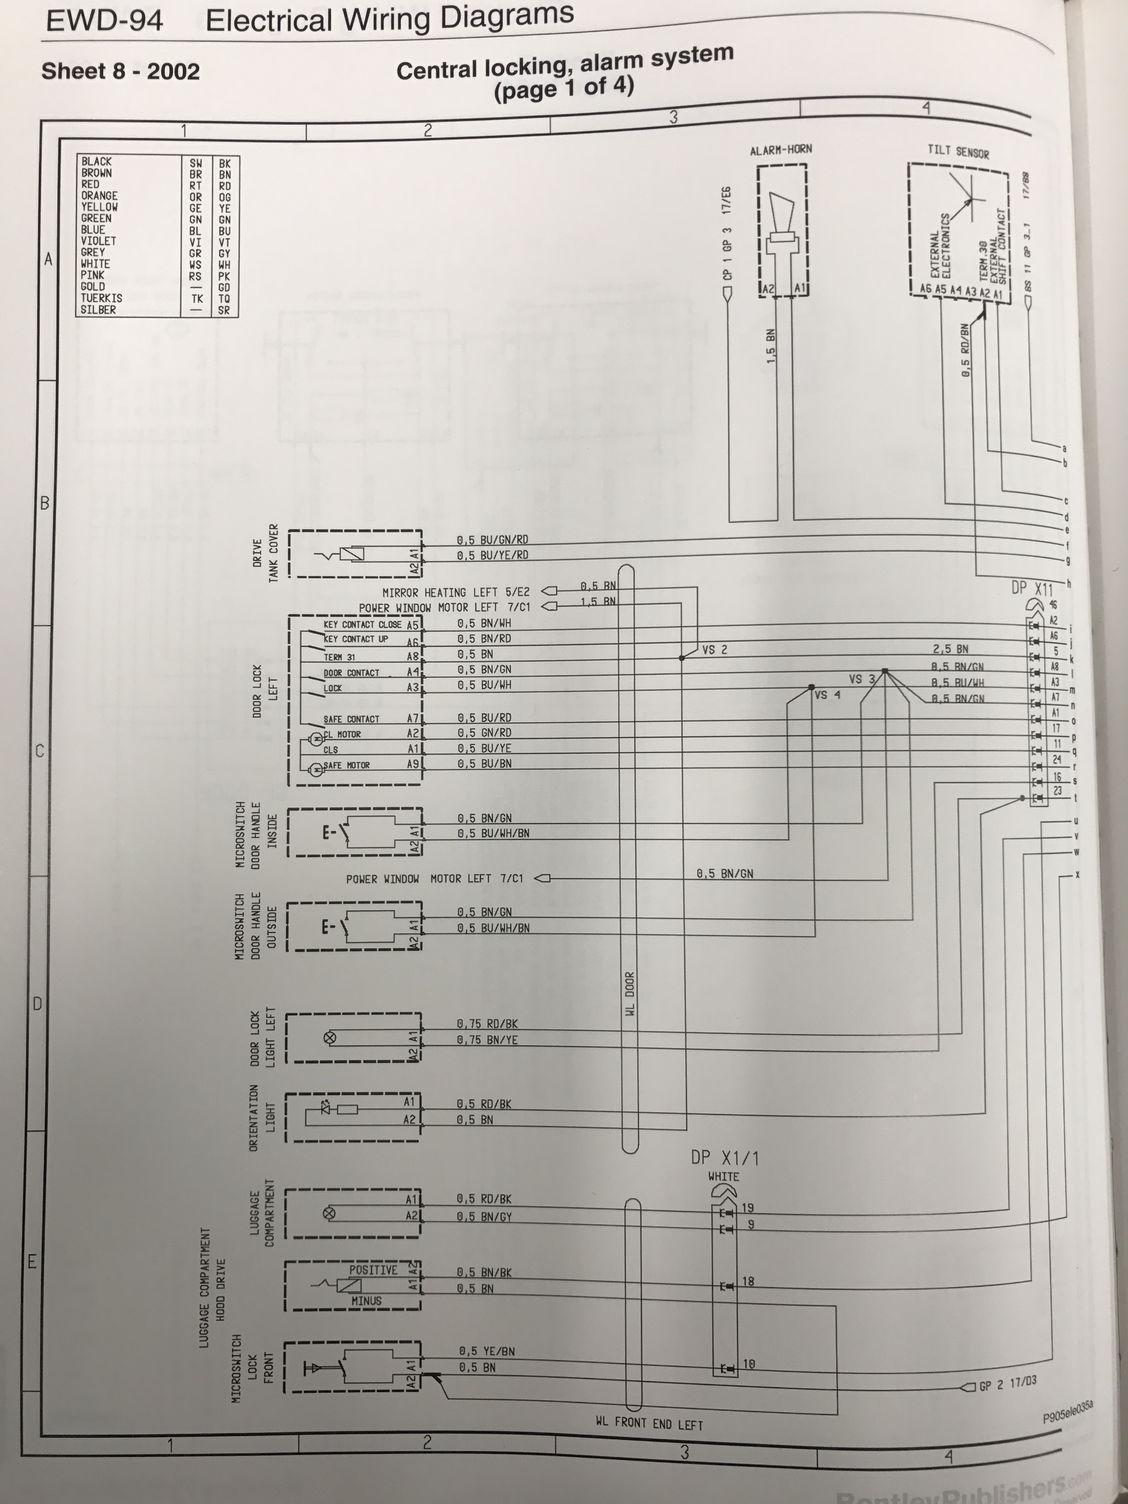 Audi A2 Wiring Diagram. Gandul. 45.77.79.119 Audi Alarm Wiring Diagram on alarm wiring circuit, 4 wire proximity diagram, alarm valve, alarm wiring guide, prox switch diagram, car alarm diagram, alarm wiring symbols, alarm wiring tools, alarm panel wiring, vehicle alarm system diagram, alarm installation diagram, alarm cable, alarm horn, fire suppression diagram, alarm circuit diagram, alarm switch diagram,